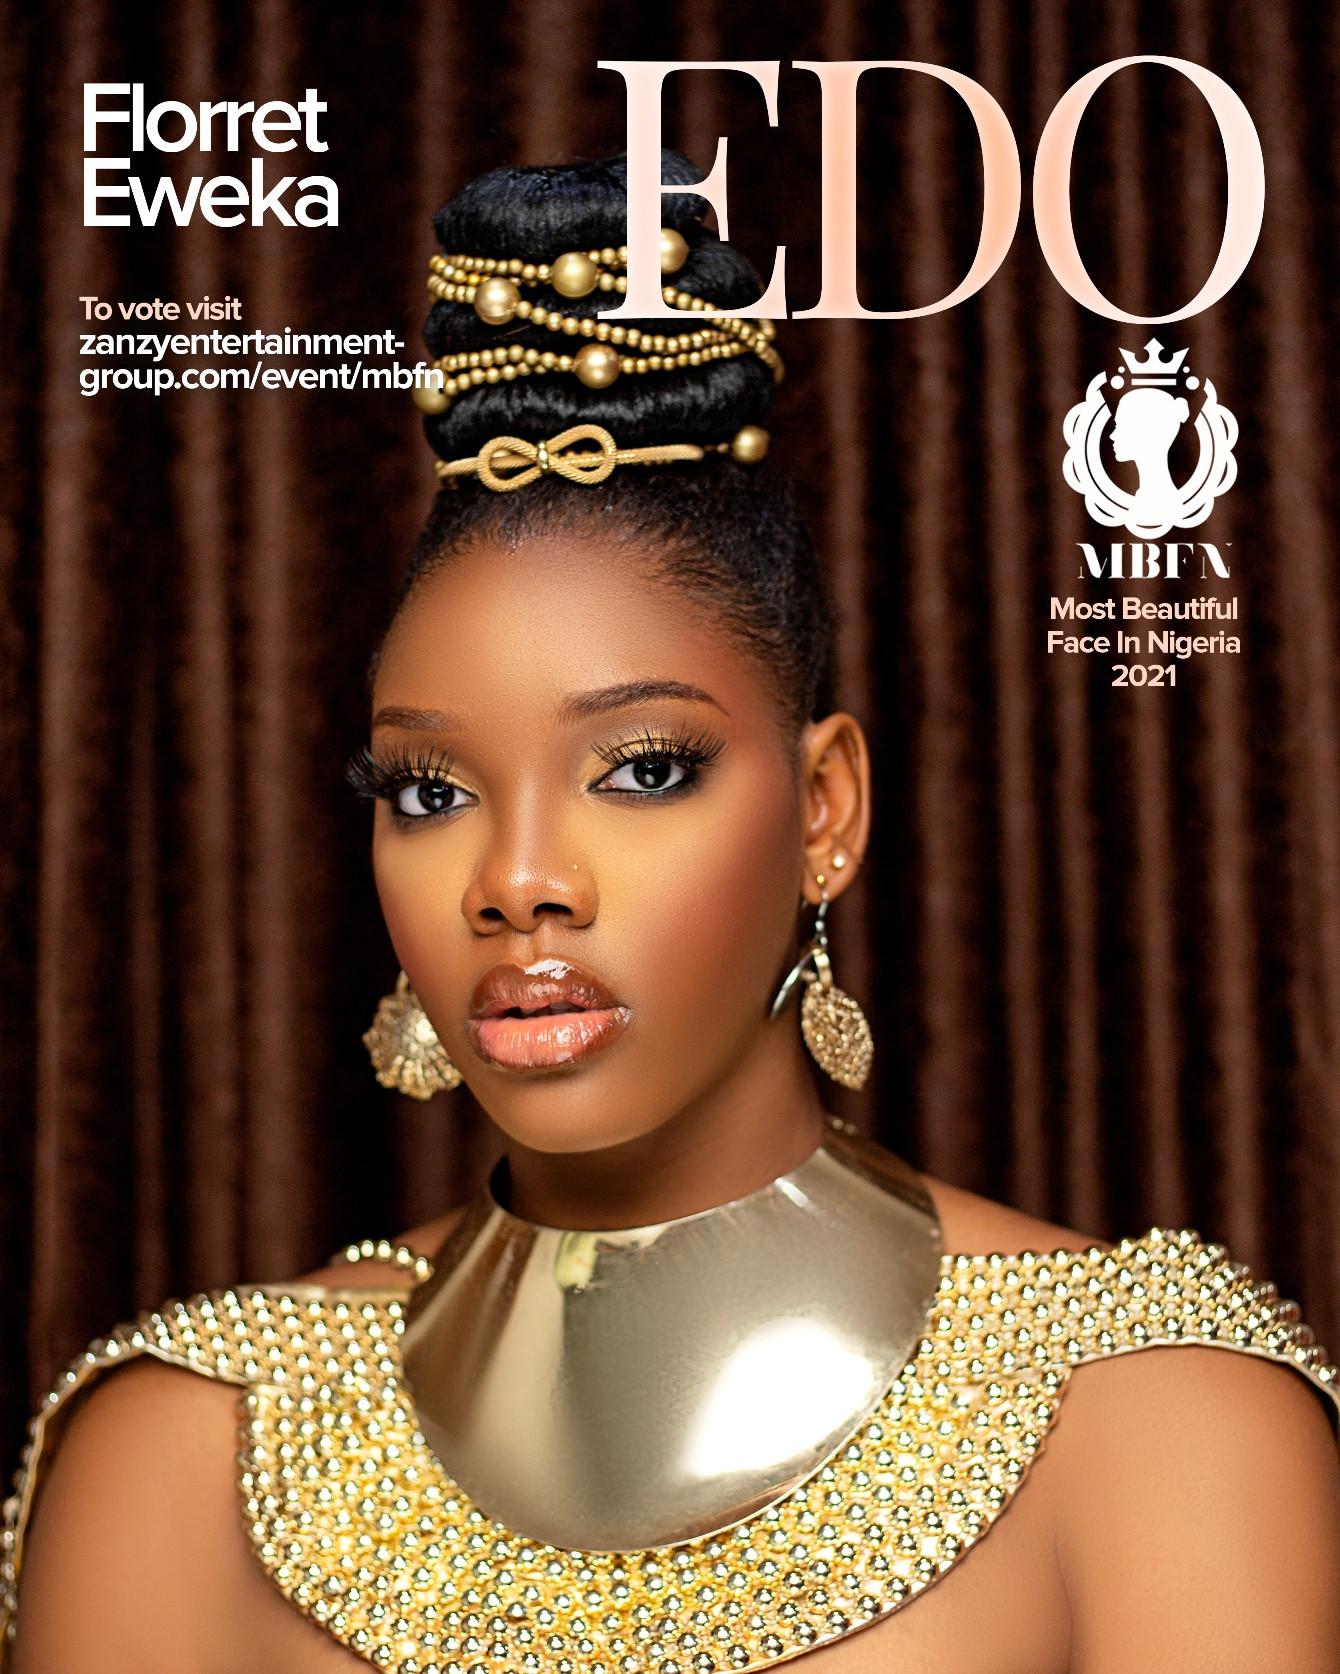 Florret Eweka Wins Most Beautiful Face in Nigeria 2021